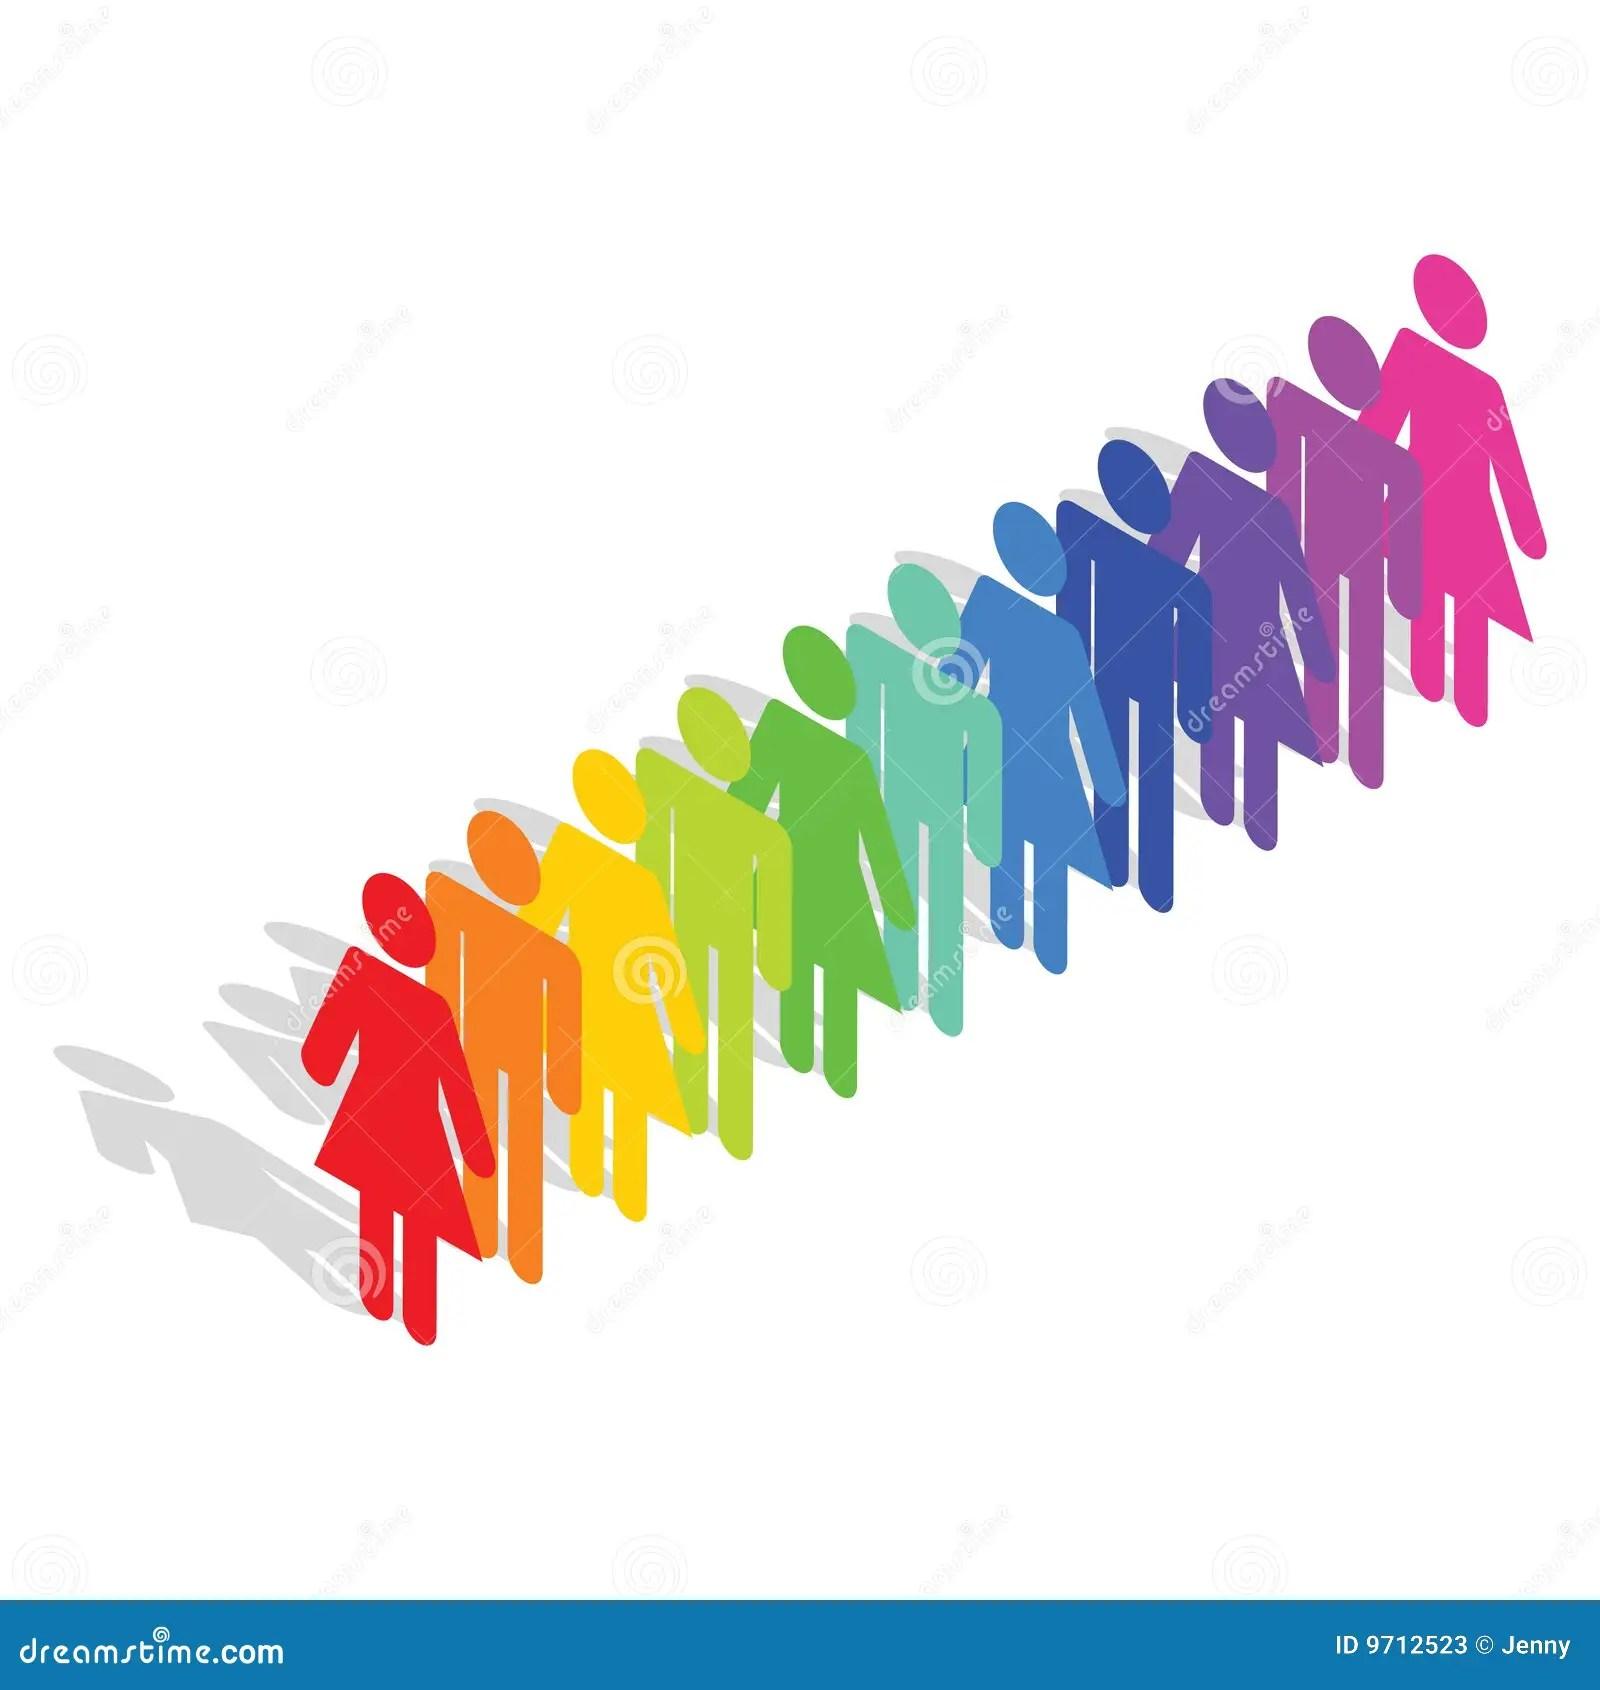 Diversity Stock Photos Image 9712523